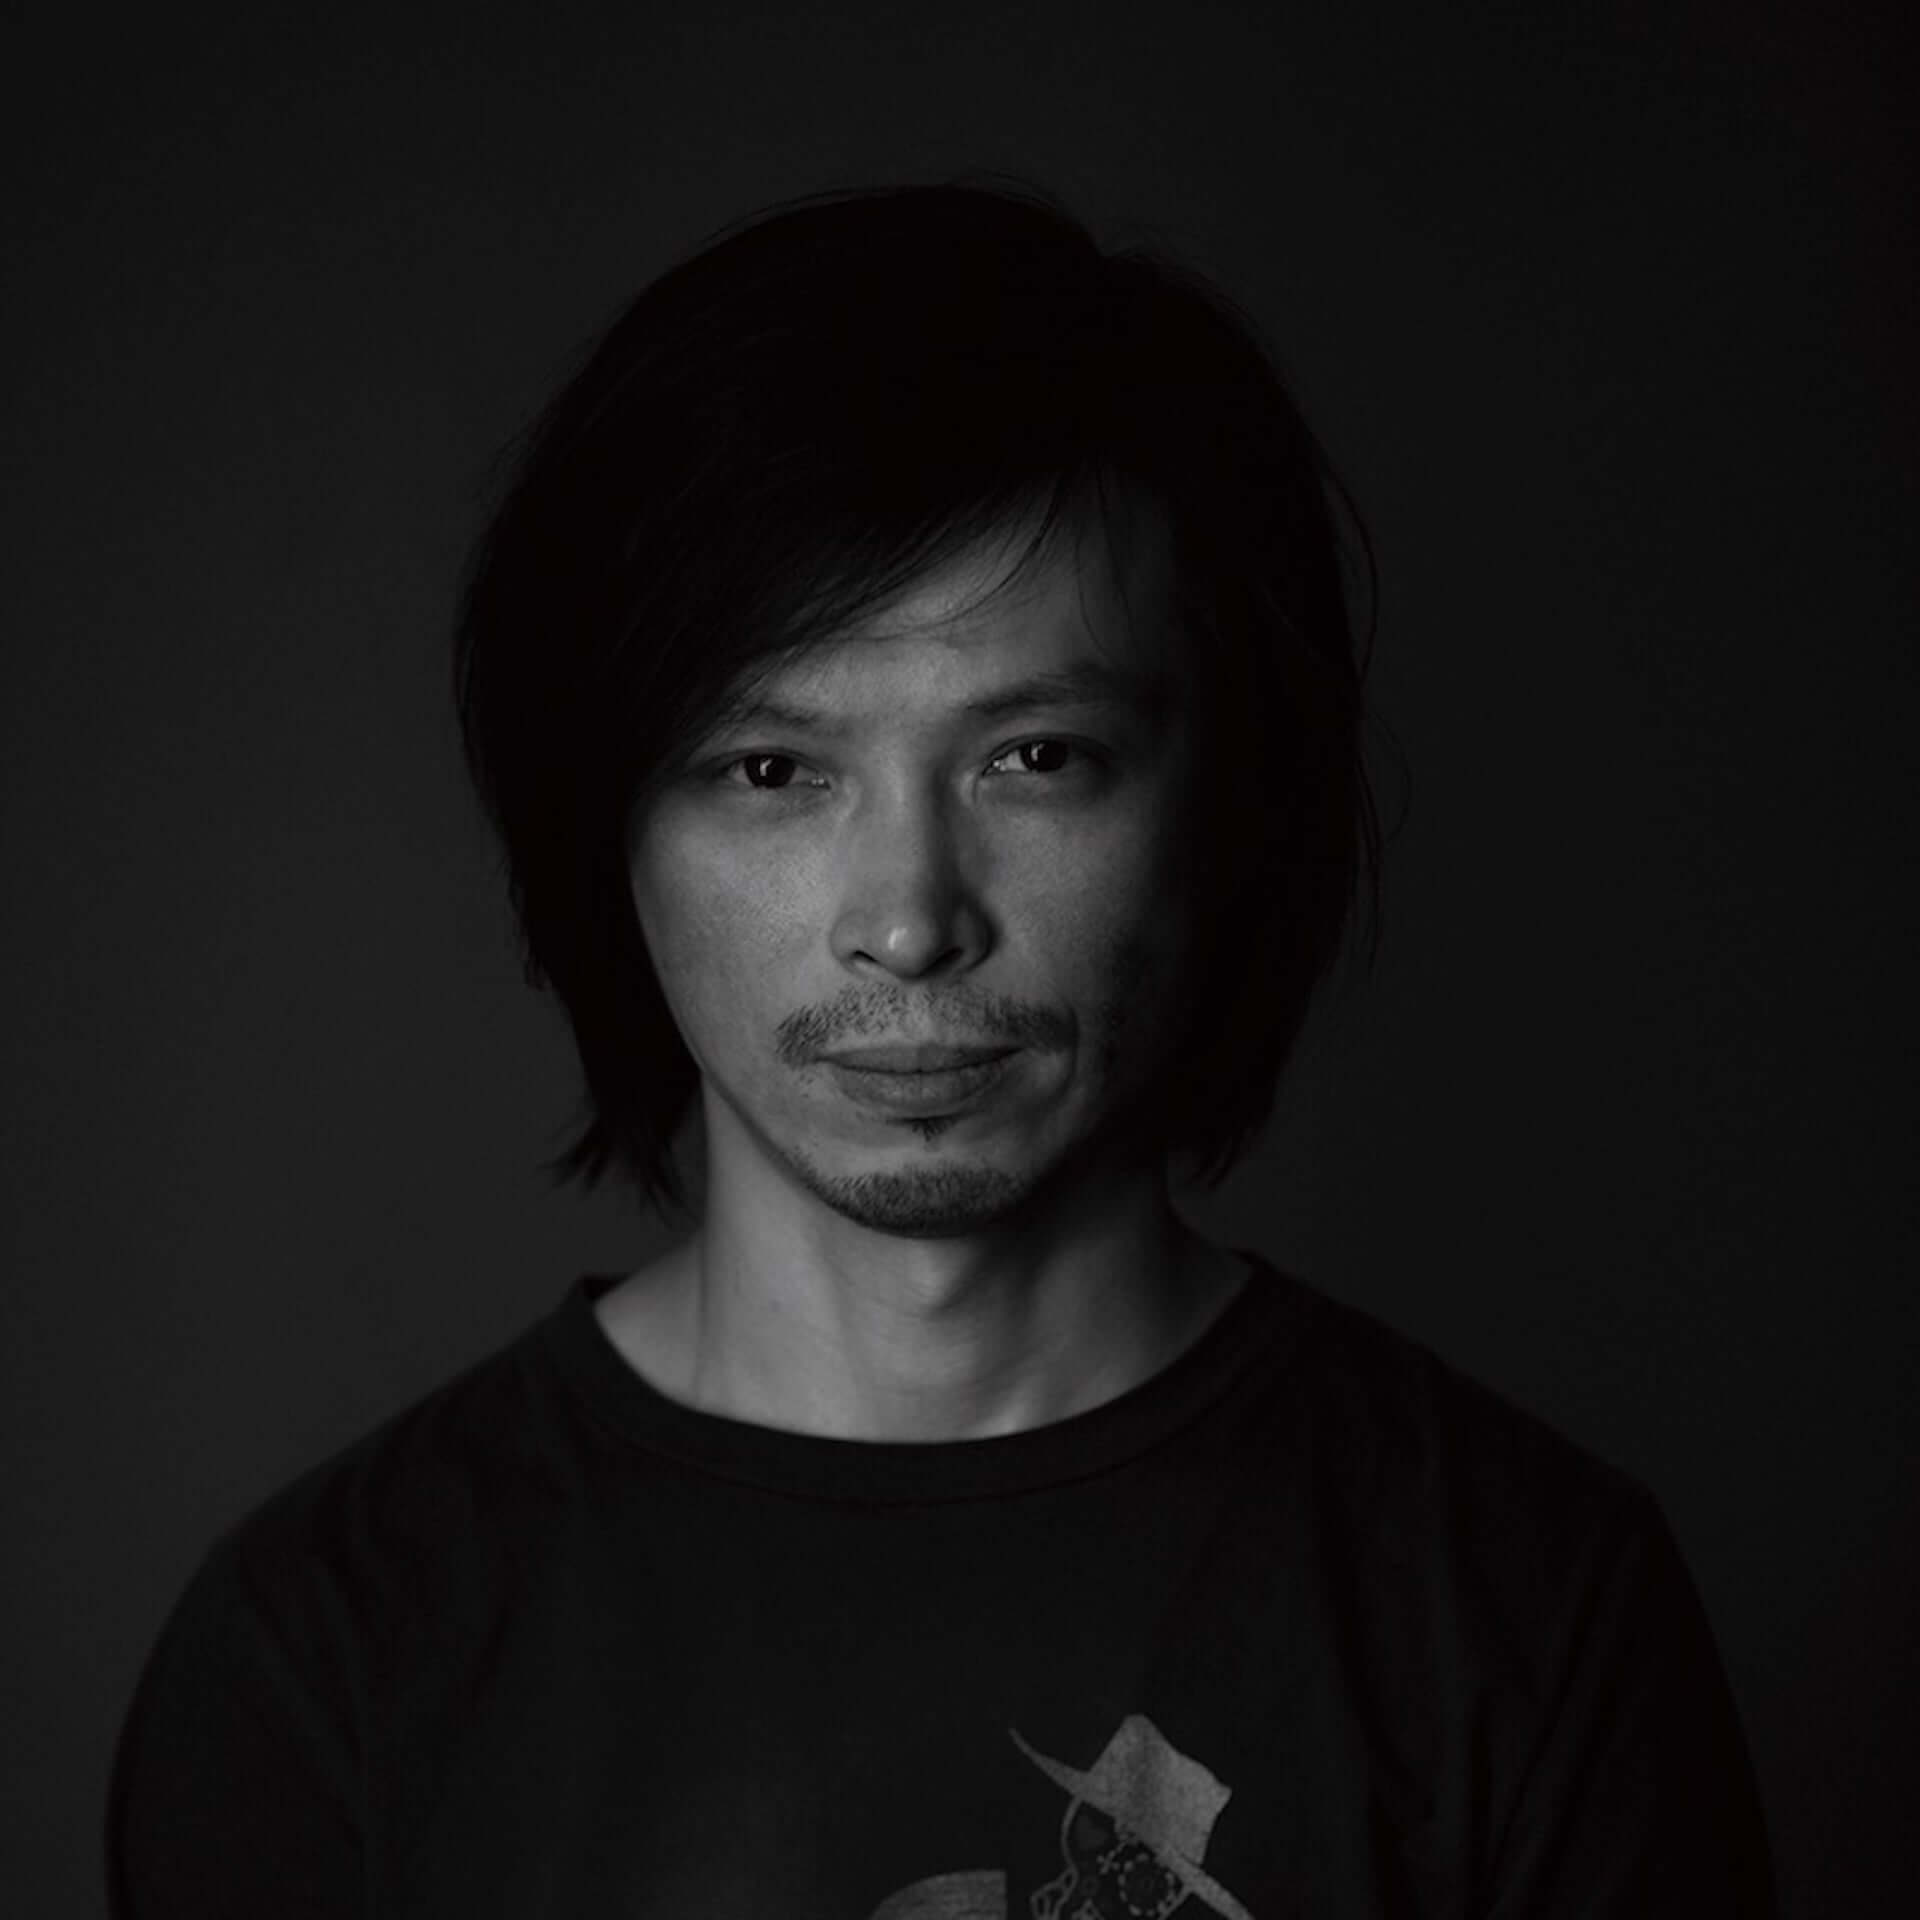 Fumiya Tanakaが渋谷Contactで6時間セットを披露!Karuta、Zooey Loomer 1979らも出演 music200929_fumiya-tanaka_2-1920x1920